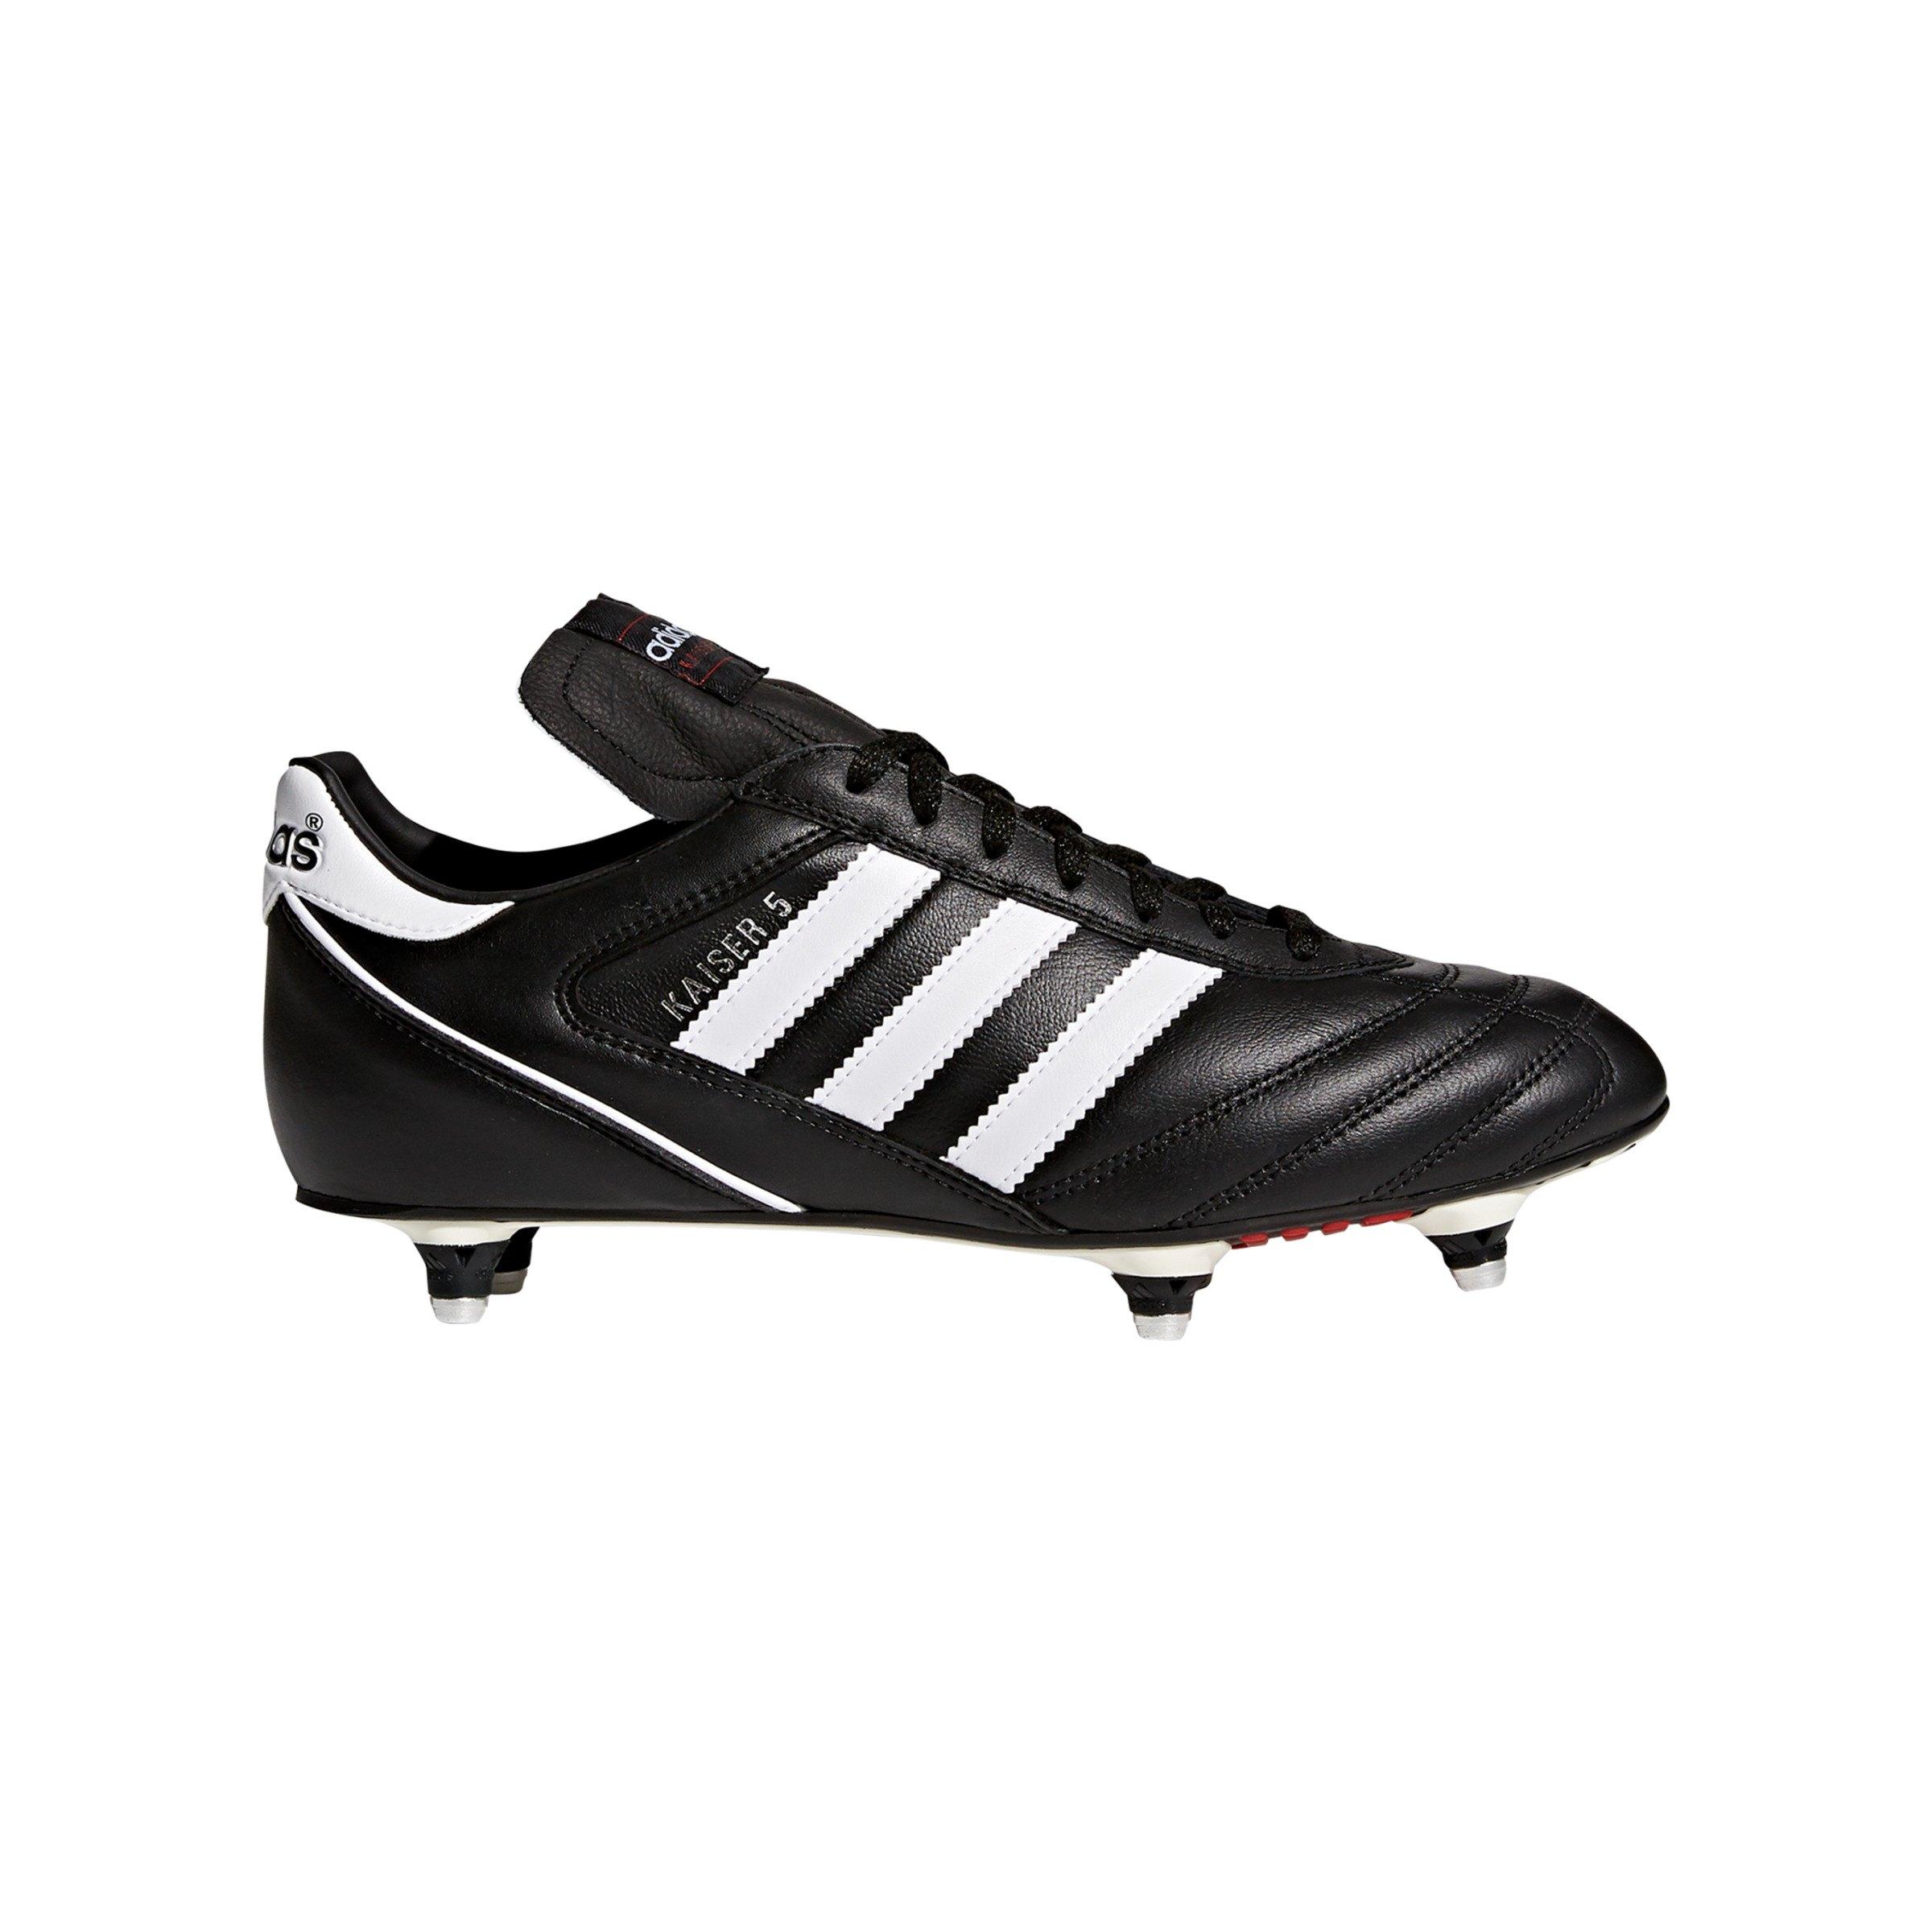 adidas Fußballschuhe Kaiser 5 Cup SG - schwarz